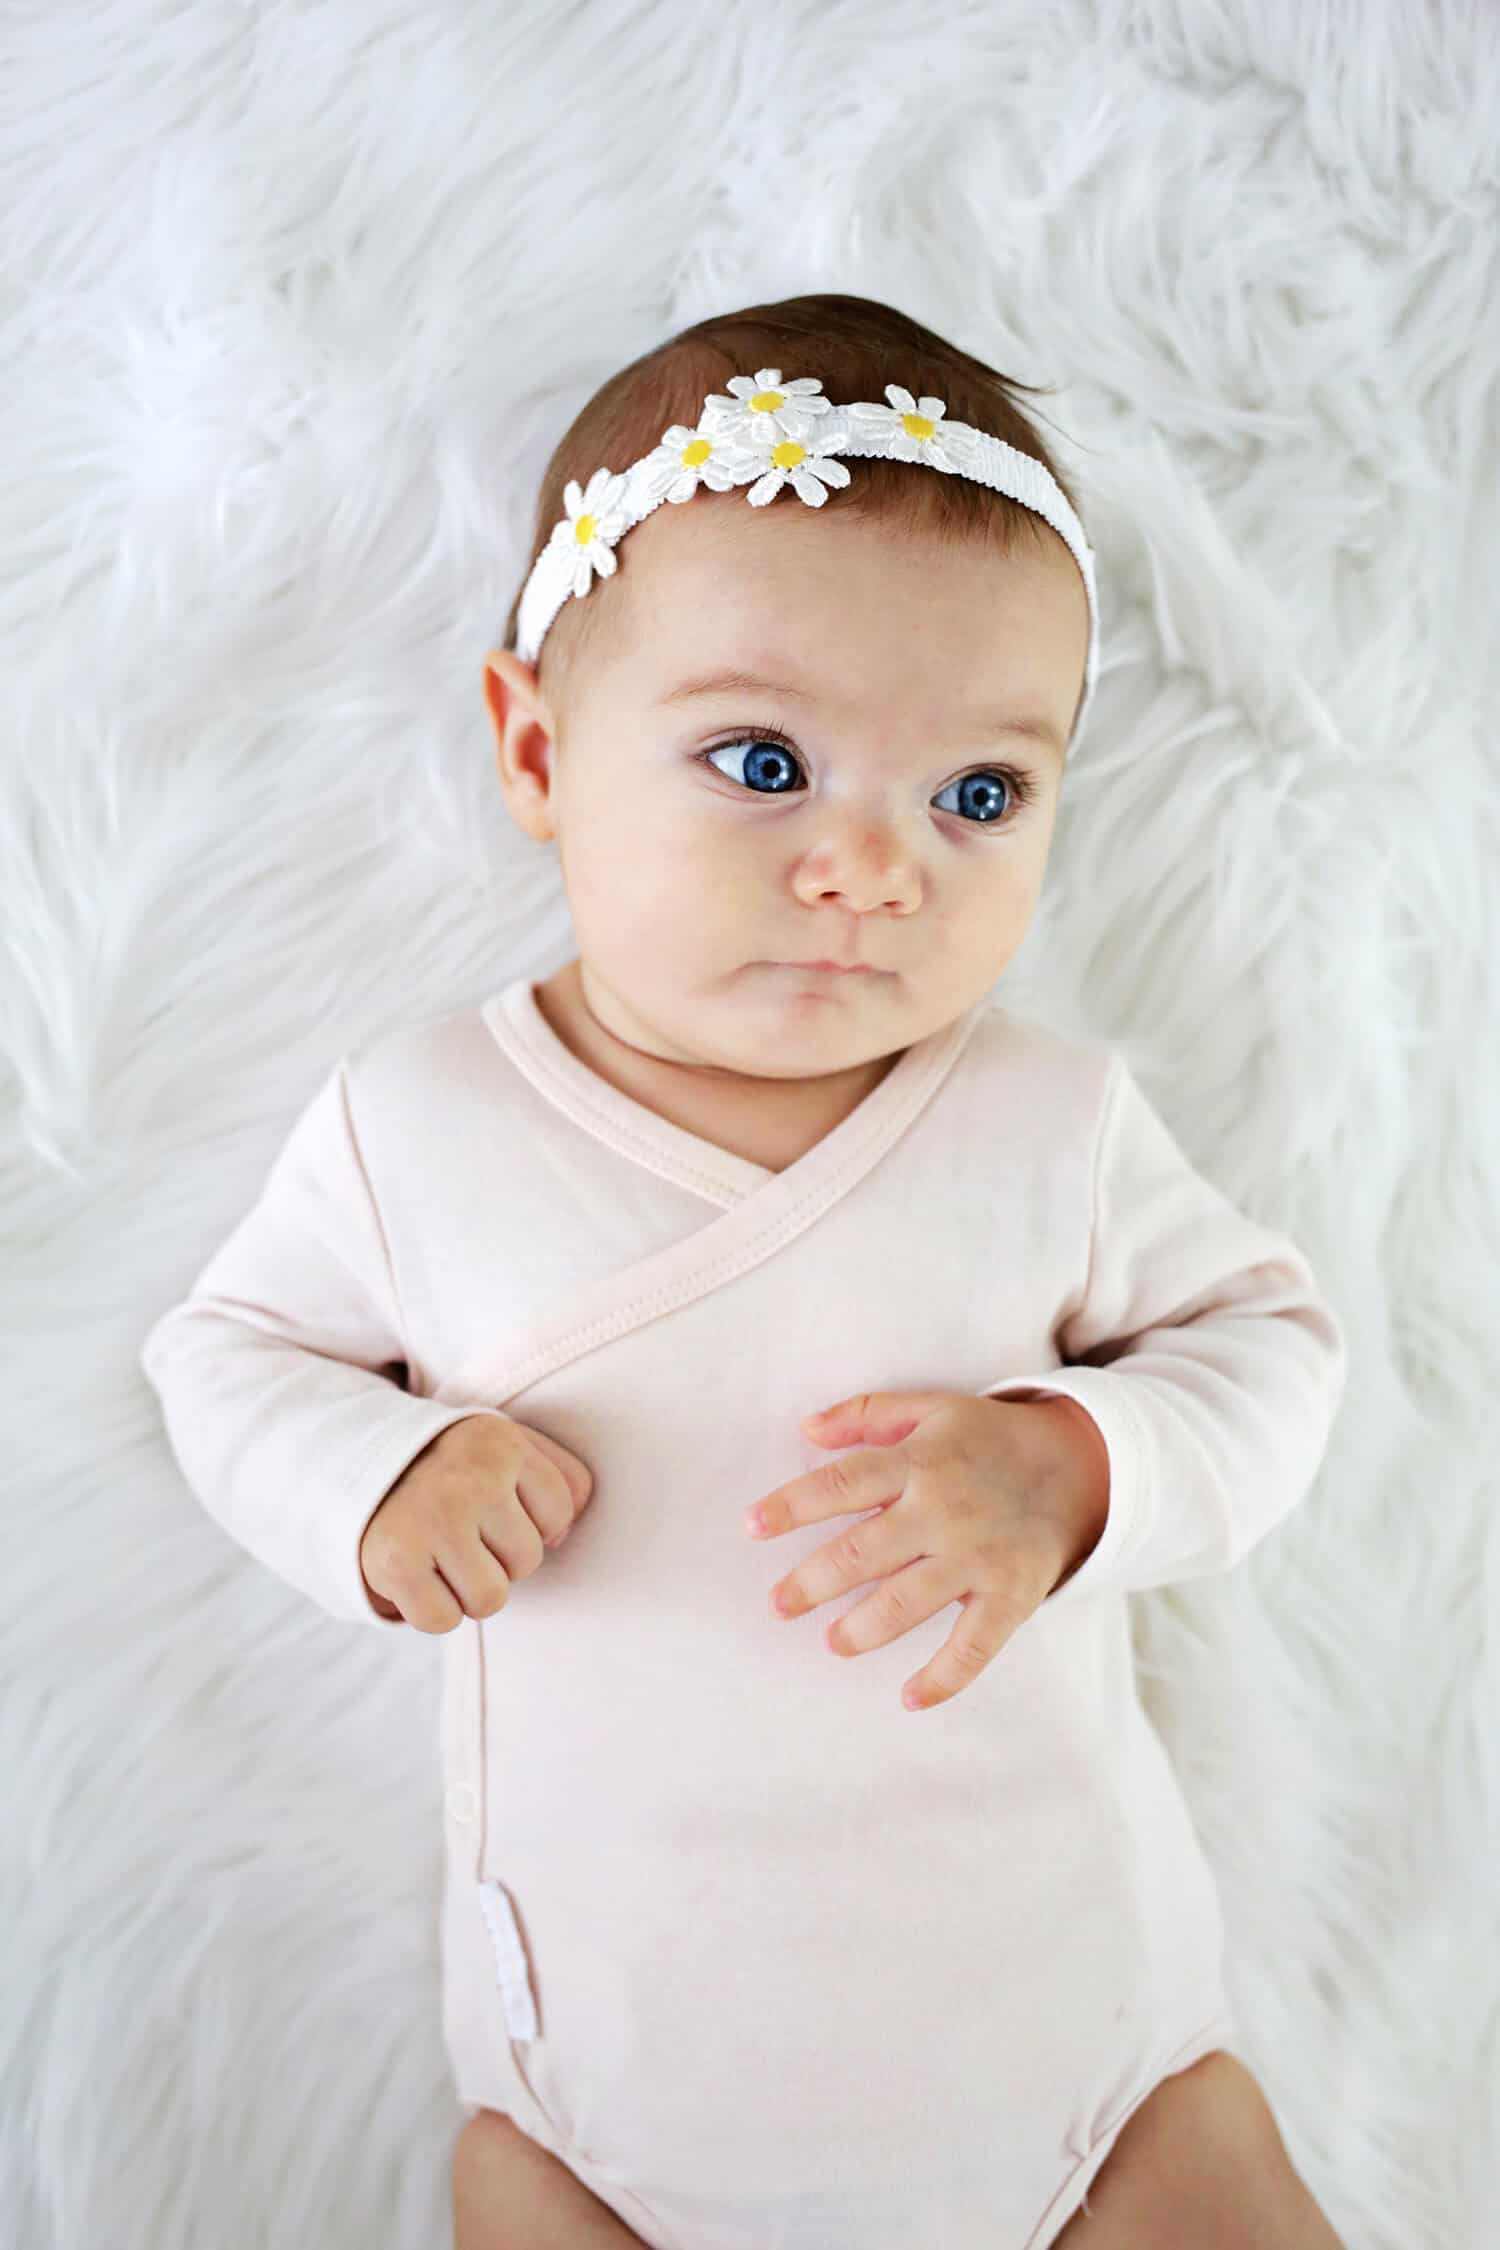 Baby Diy  Baby Headband DIY 3 Ways and No Sew A Beautiful Mess